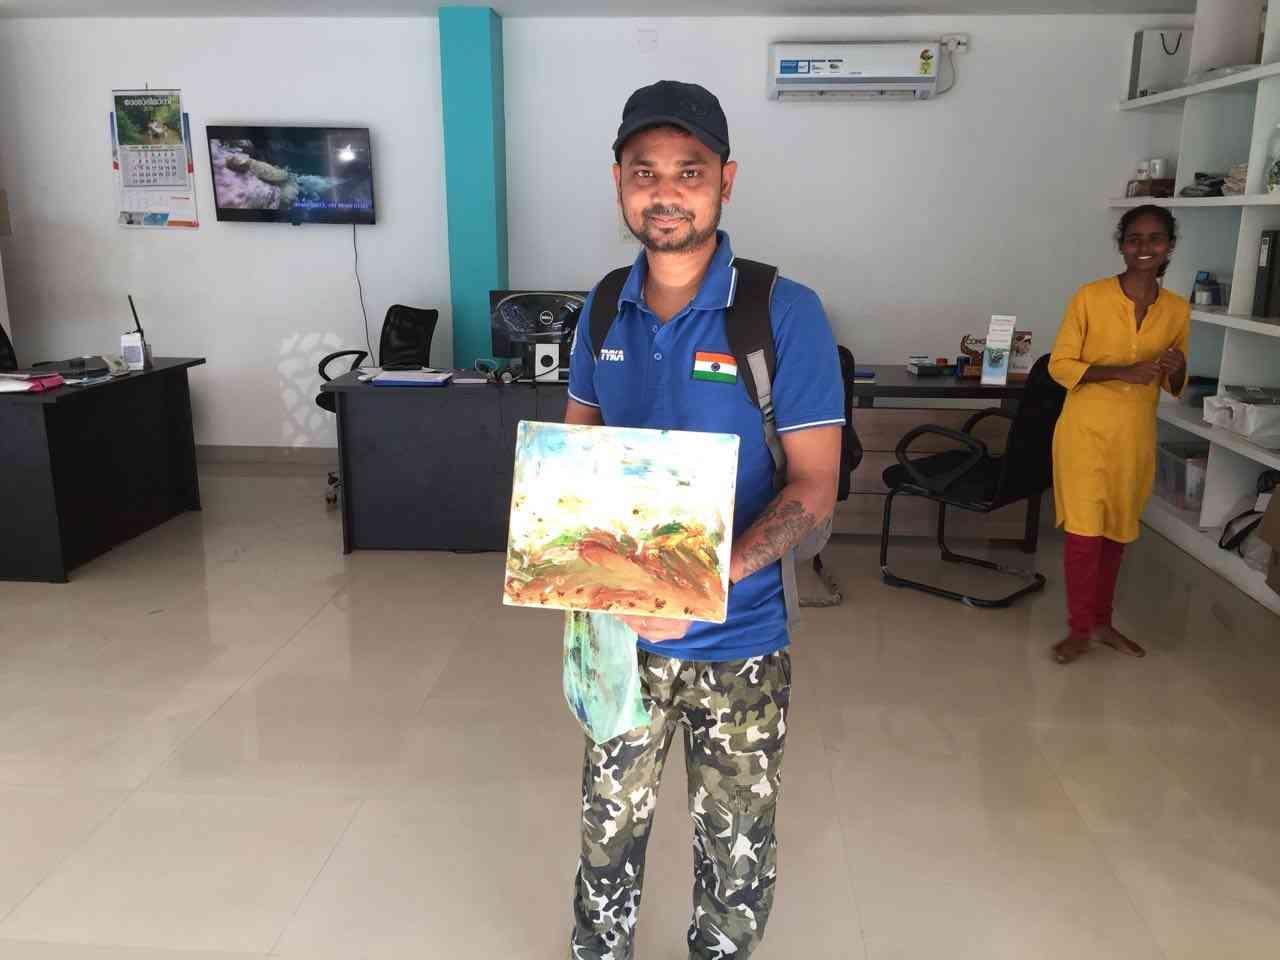 ajmer boy made underwater painting in Indian ocean